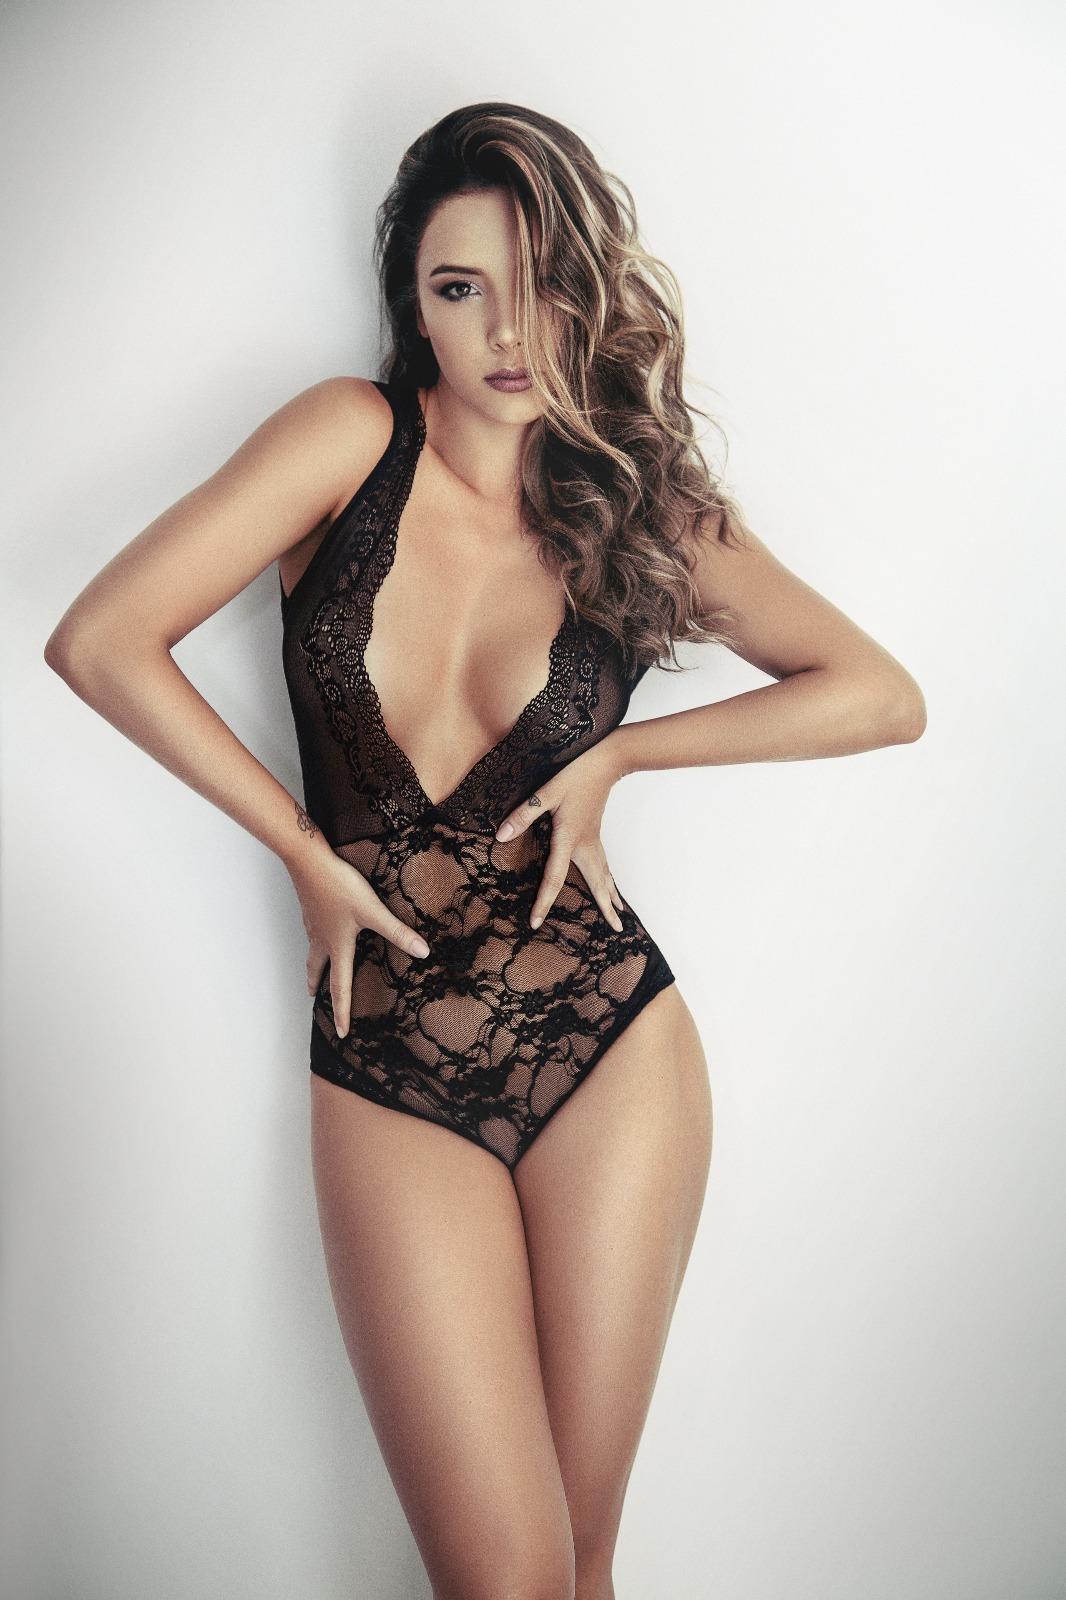 Omi lenceria, ropa interior, lingerie Anna Peñafort